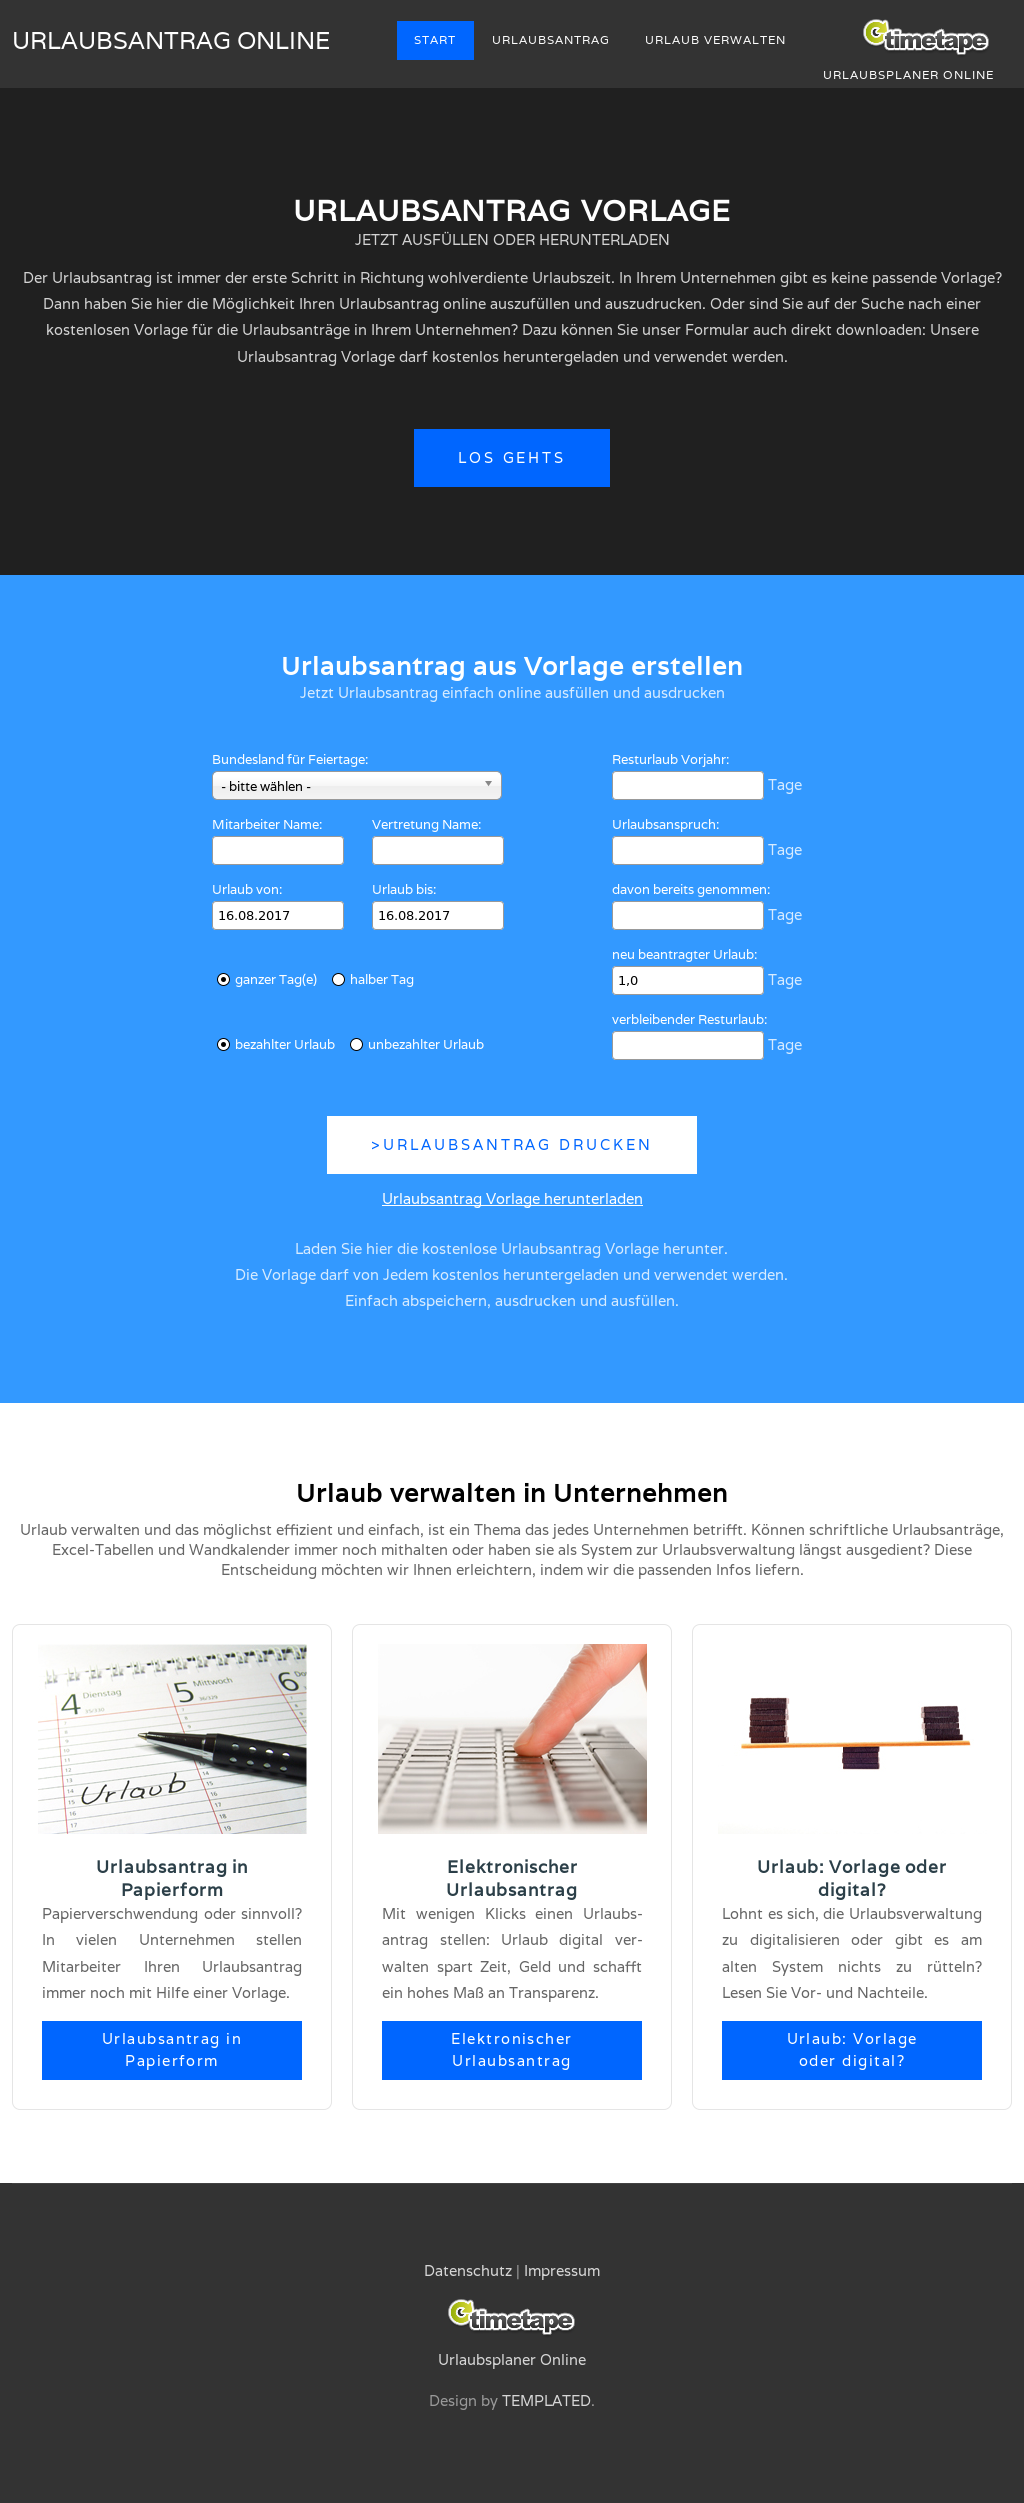 timetape website history - Urlaubsantrag Muster